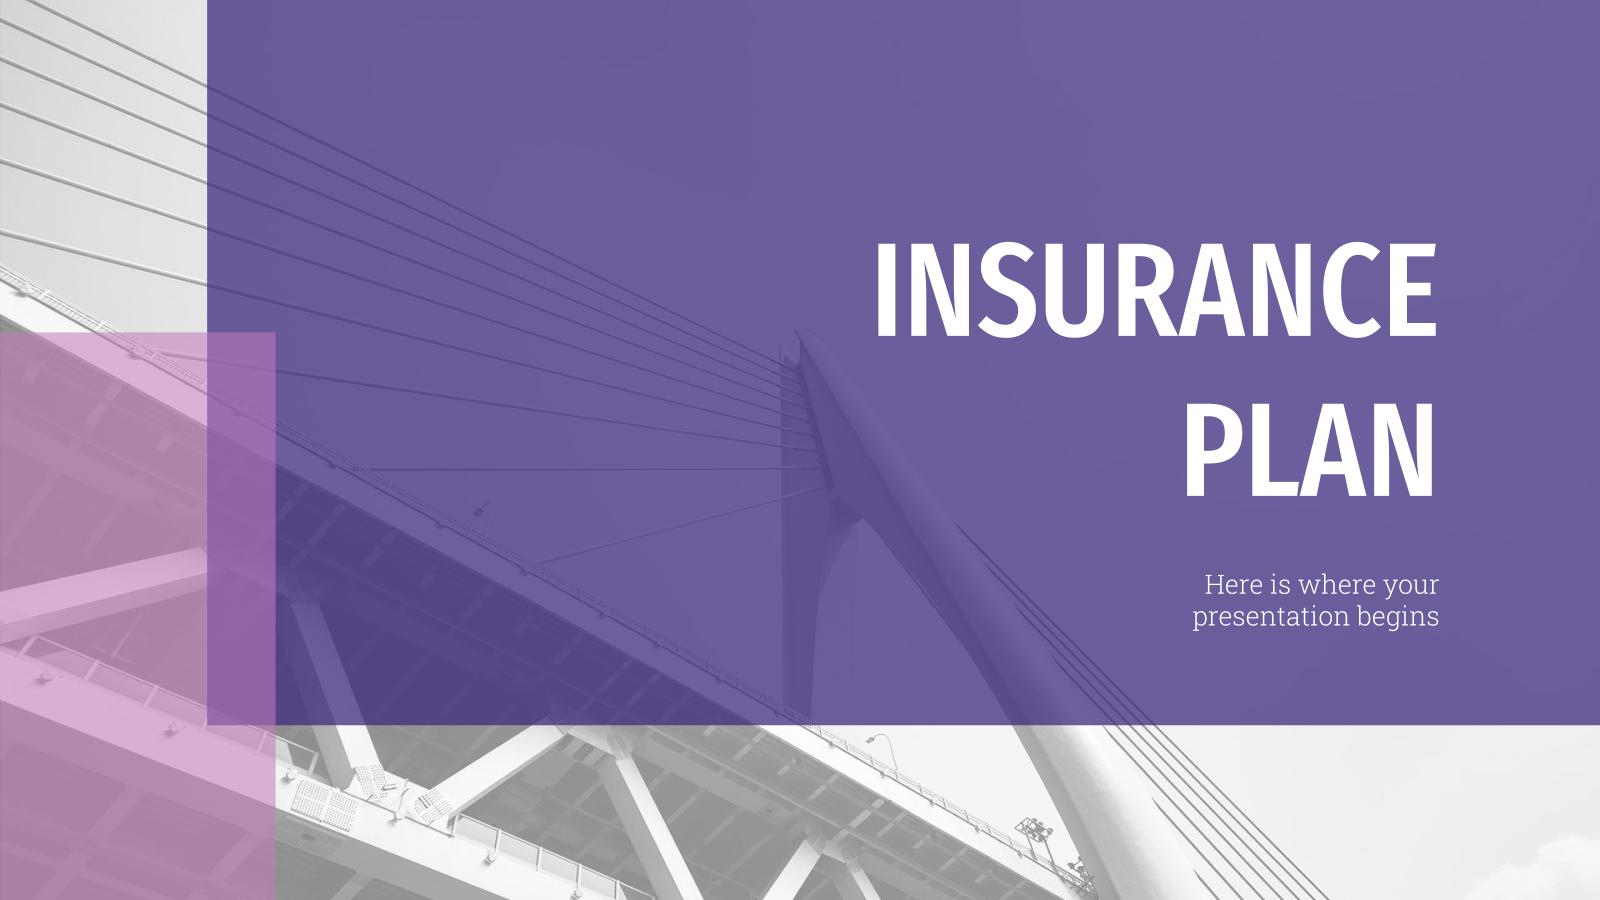 Plantilla de presentación Plan de seguros